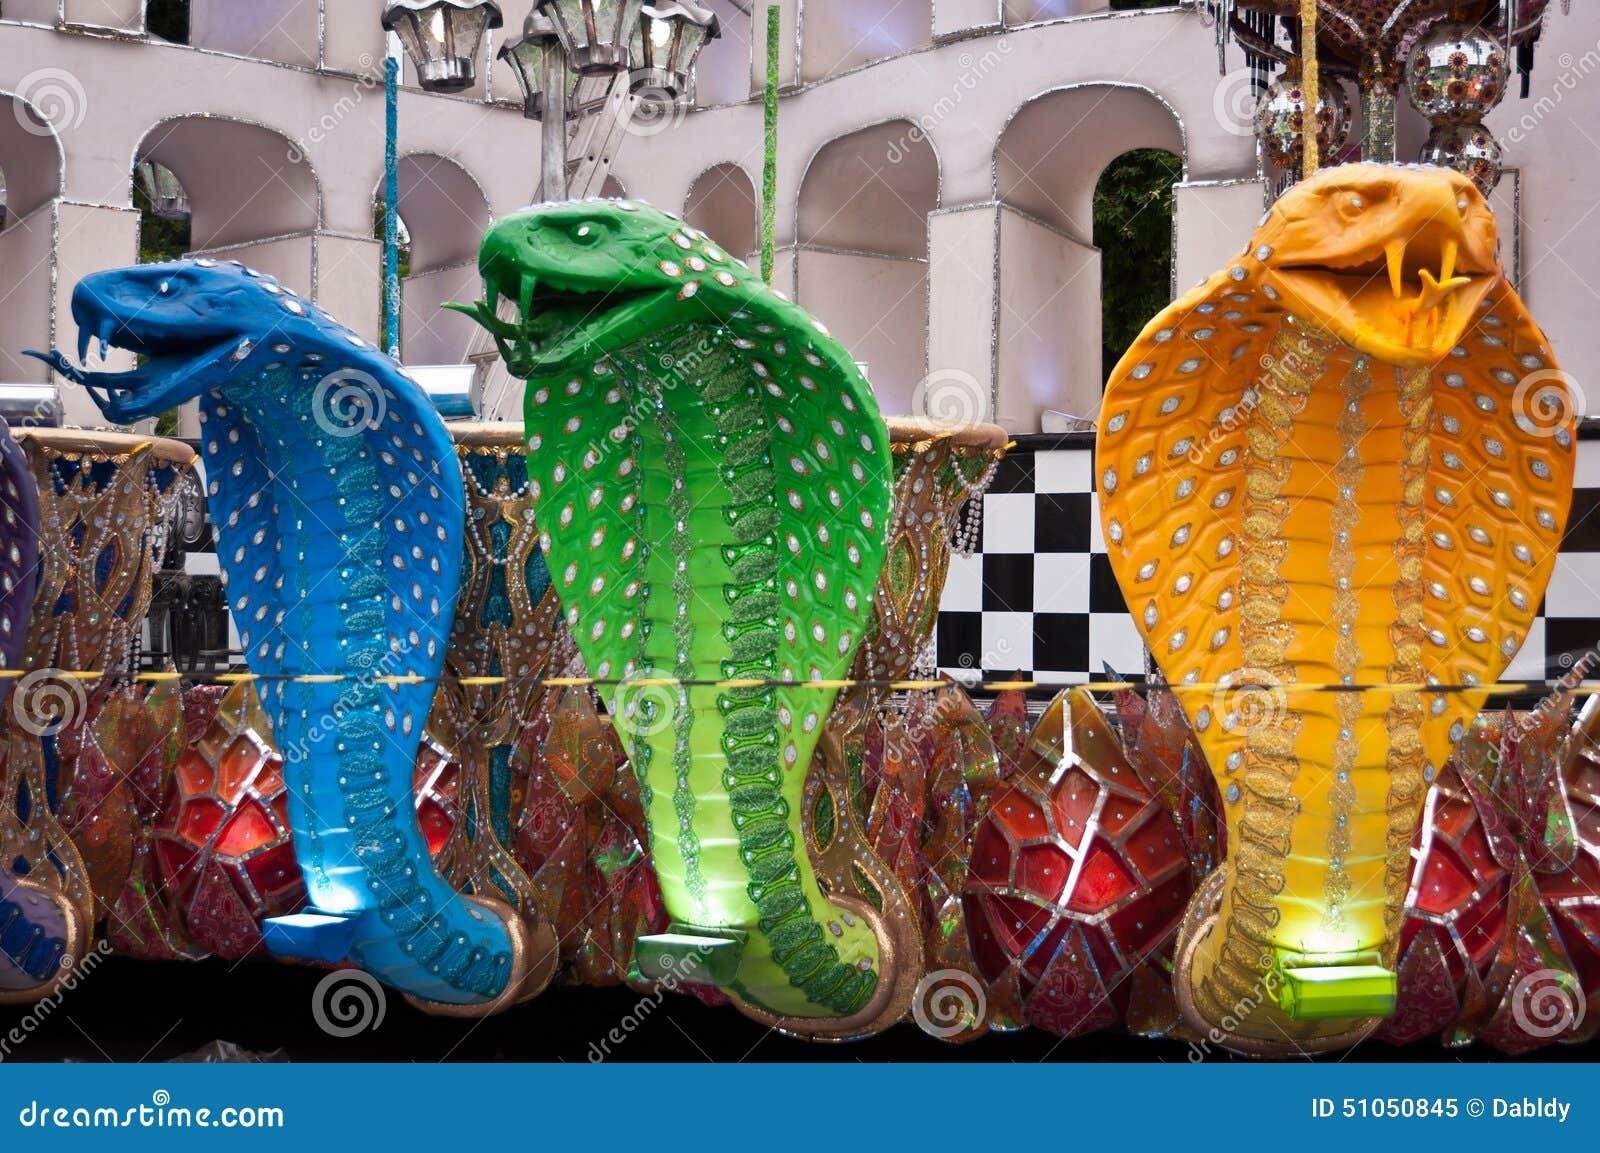 brazil carnival float - Float Decorations